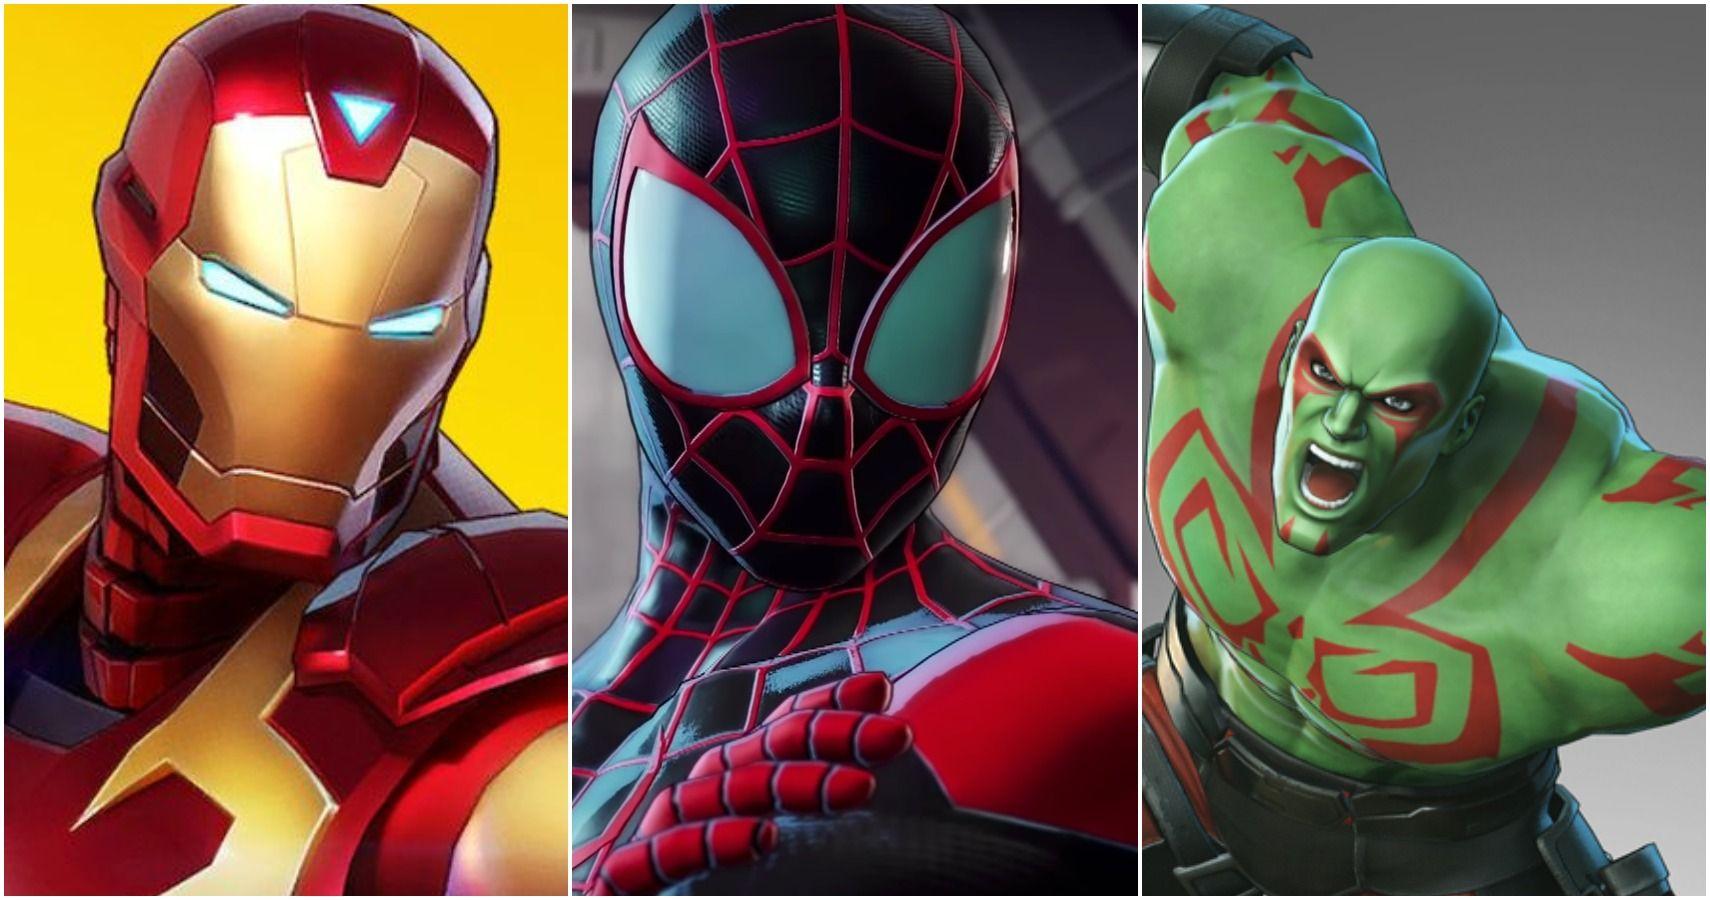 The 10 Weakest Heroes In Marvel Ultimate Alliance 3, Ranked